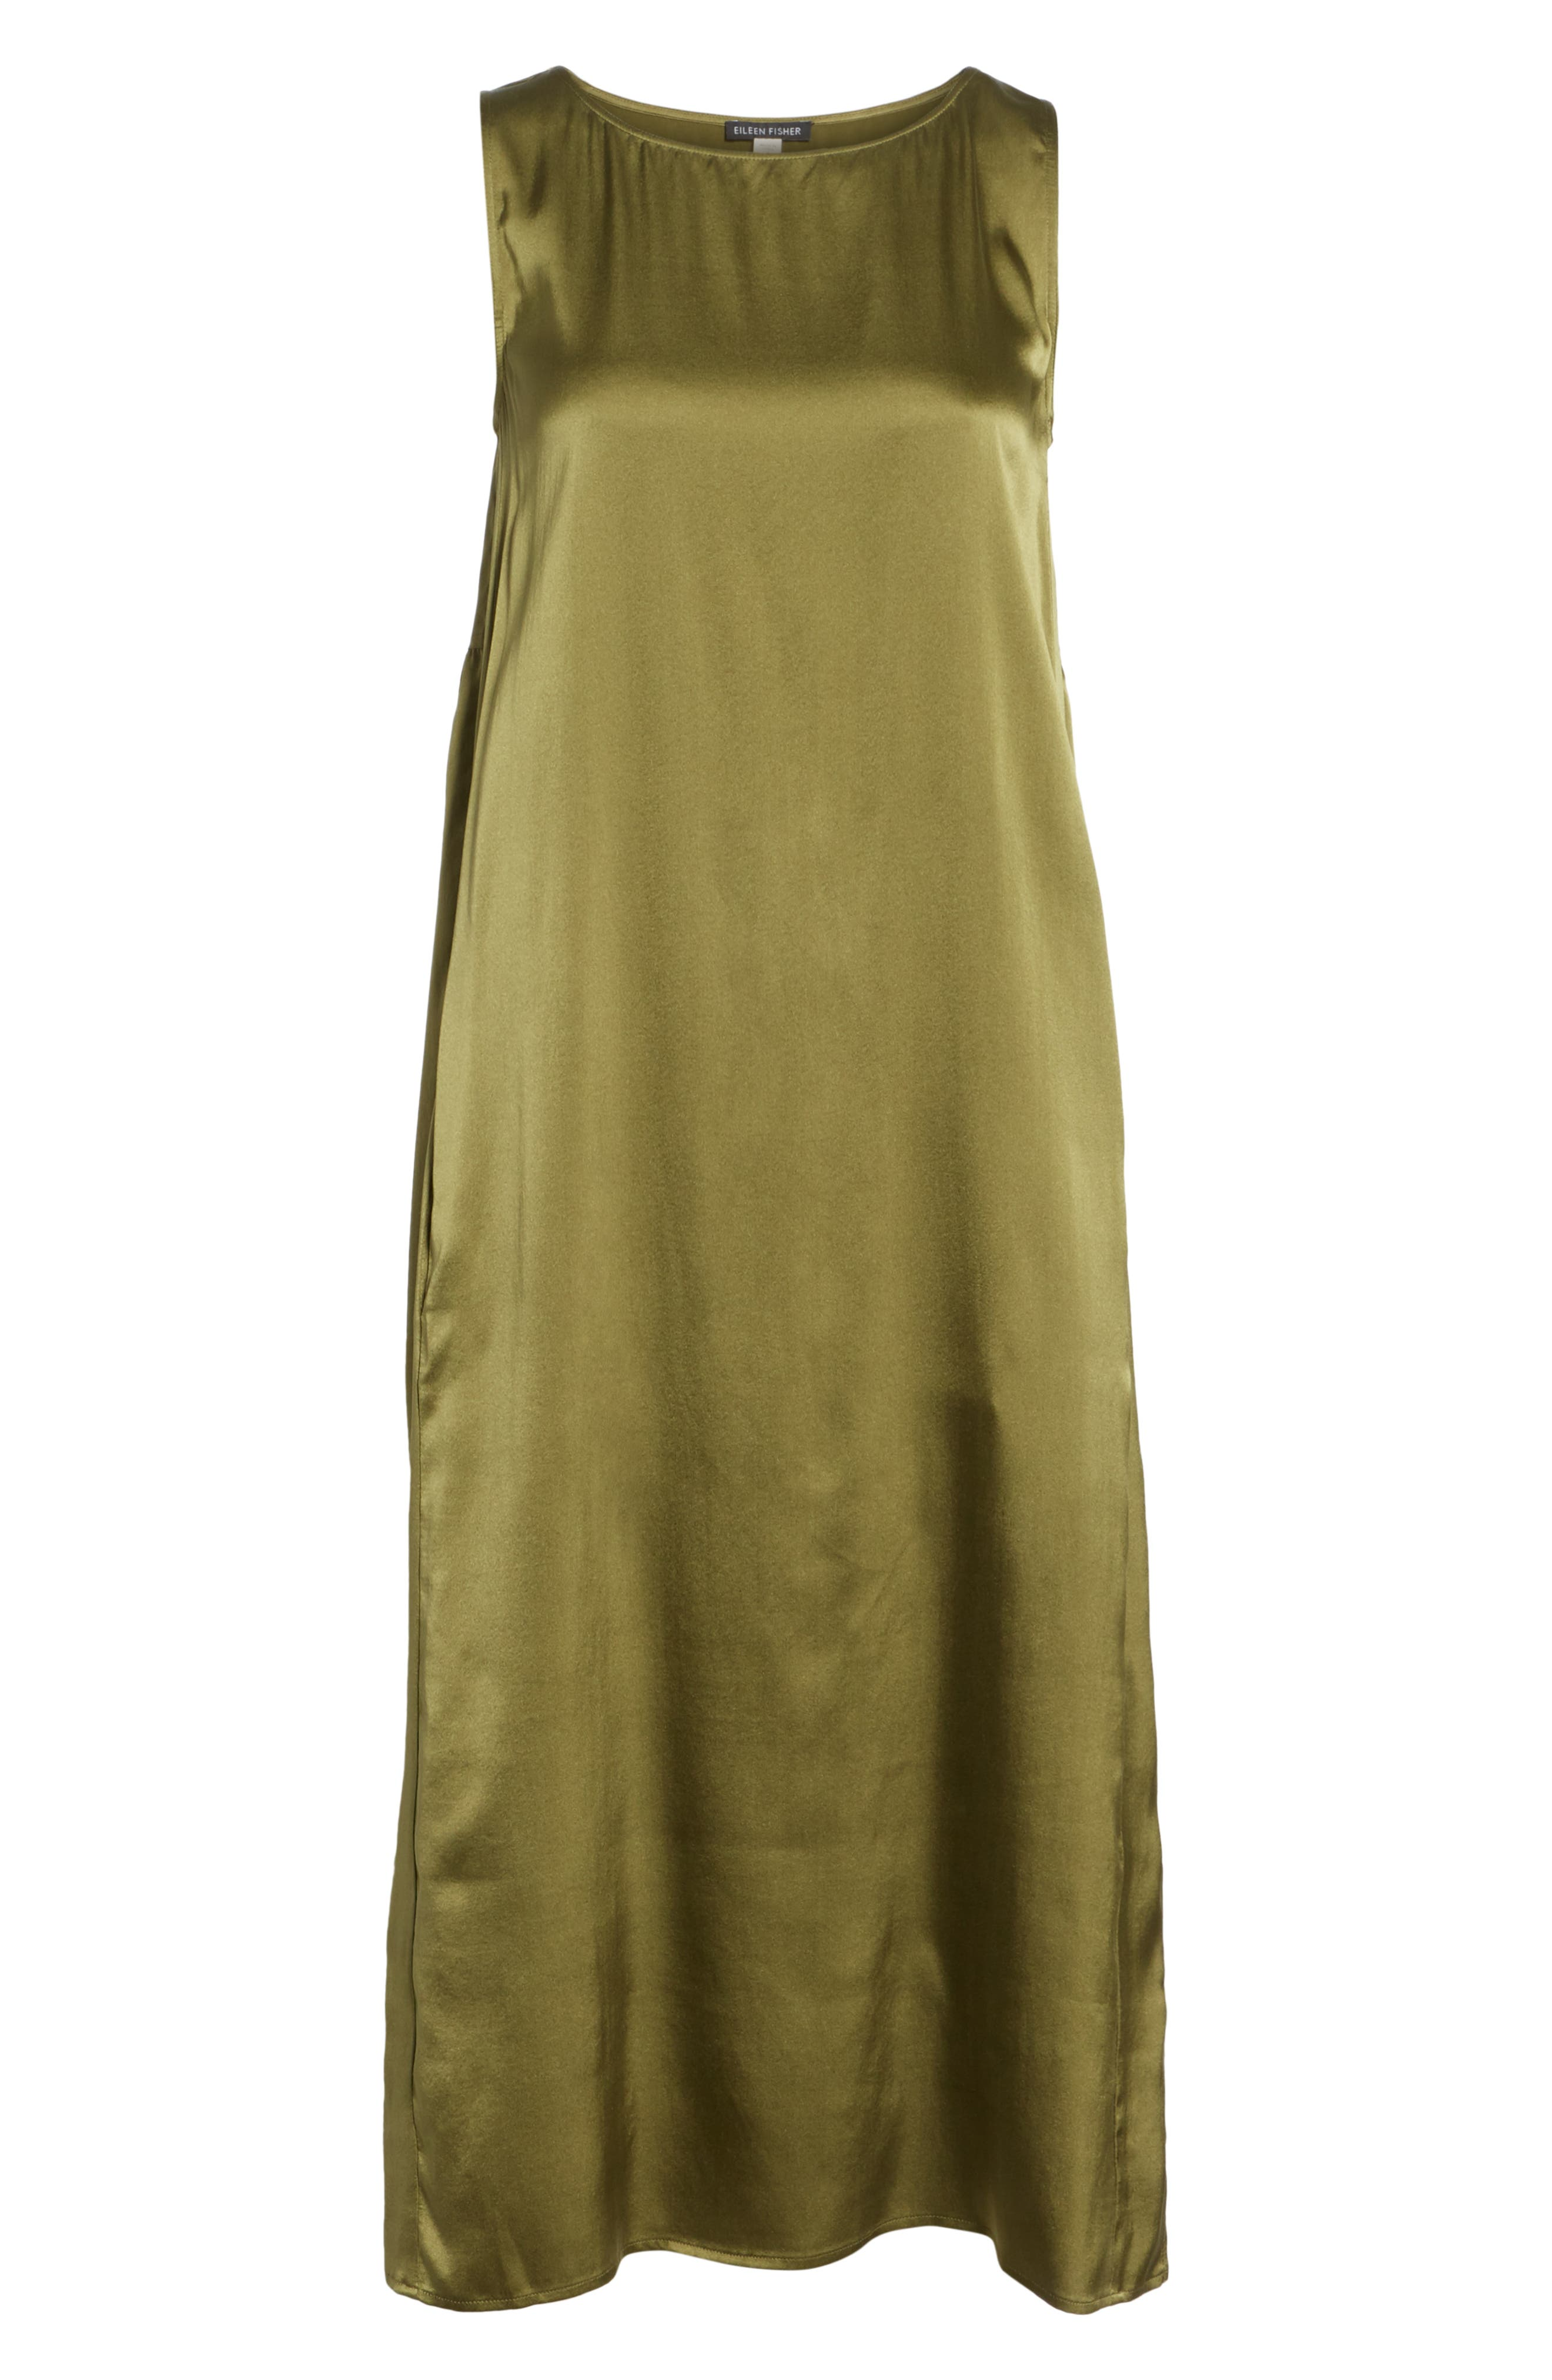 EILEEN FISHER,                             Stretch Silk Tank Dress,                             Alternate thumbnail 7, color,                             301